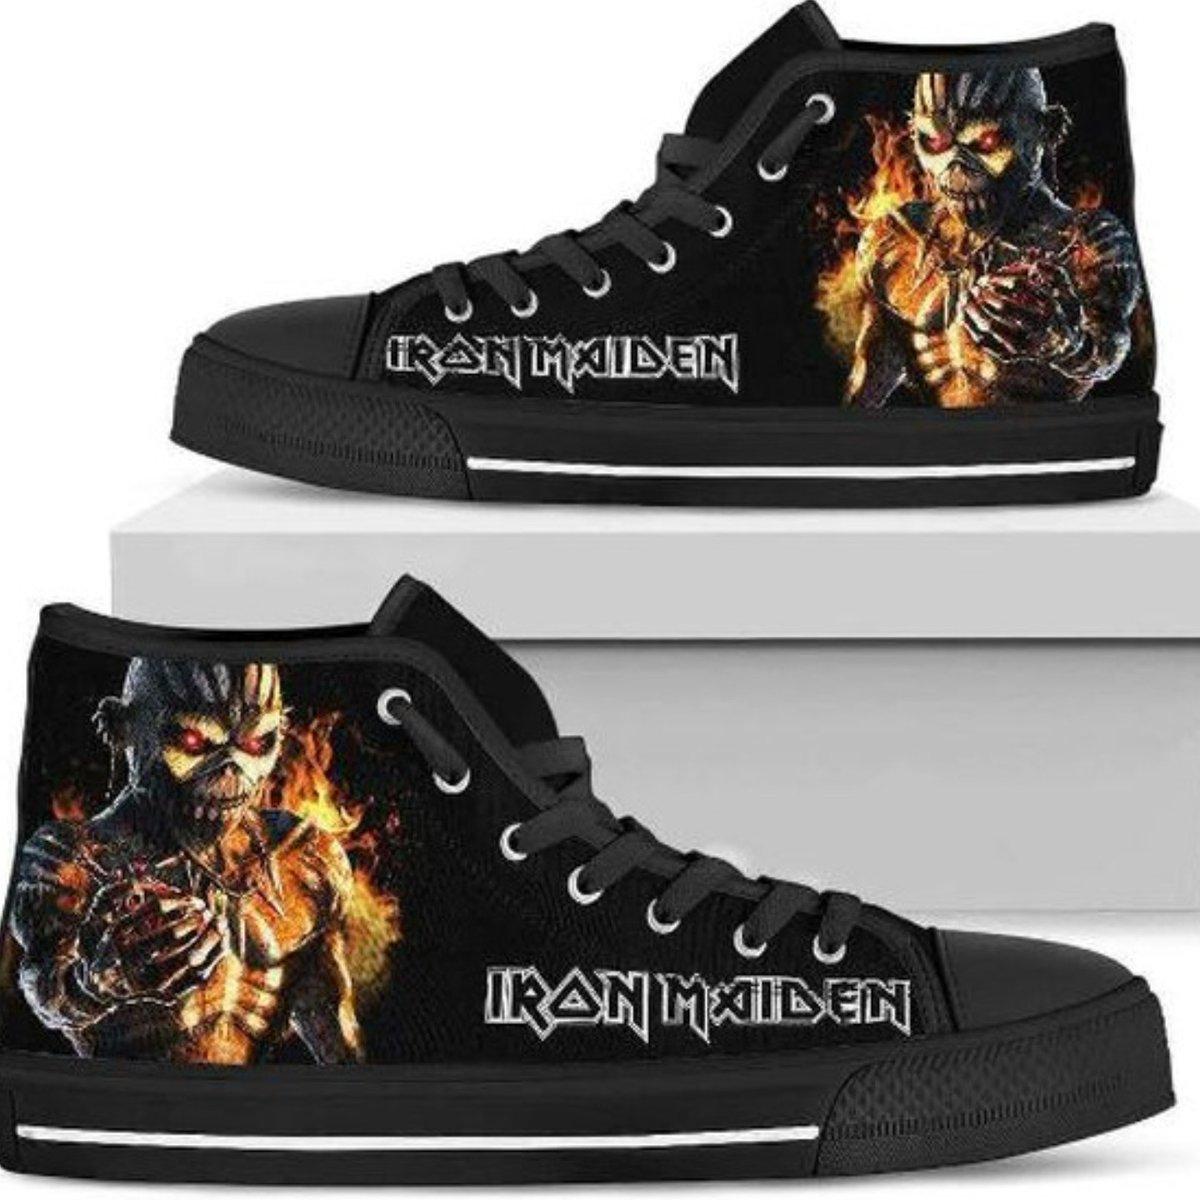 fbdfd00cb0d Igor rakocevic on twitter jpg 1200x1200 Iron maiden shoes